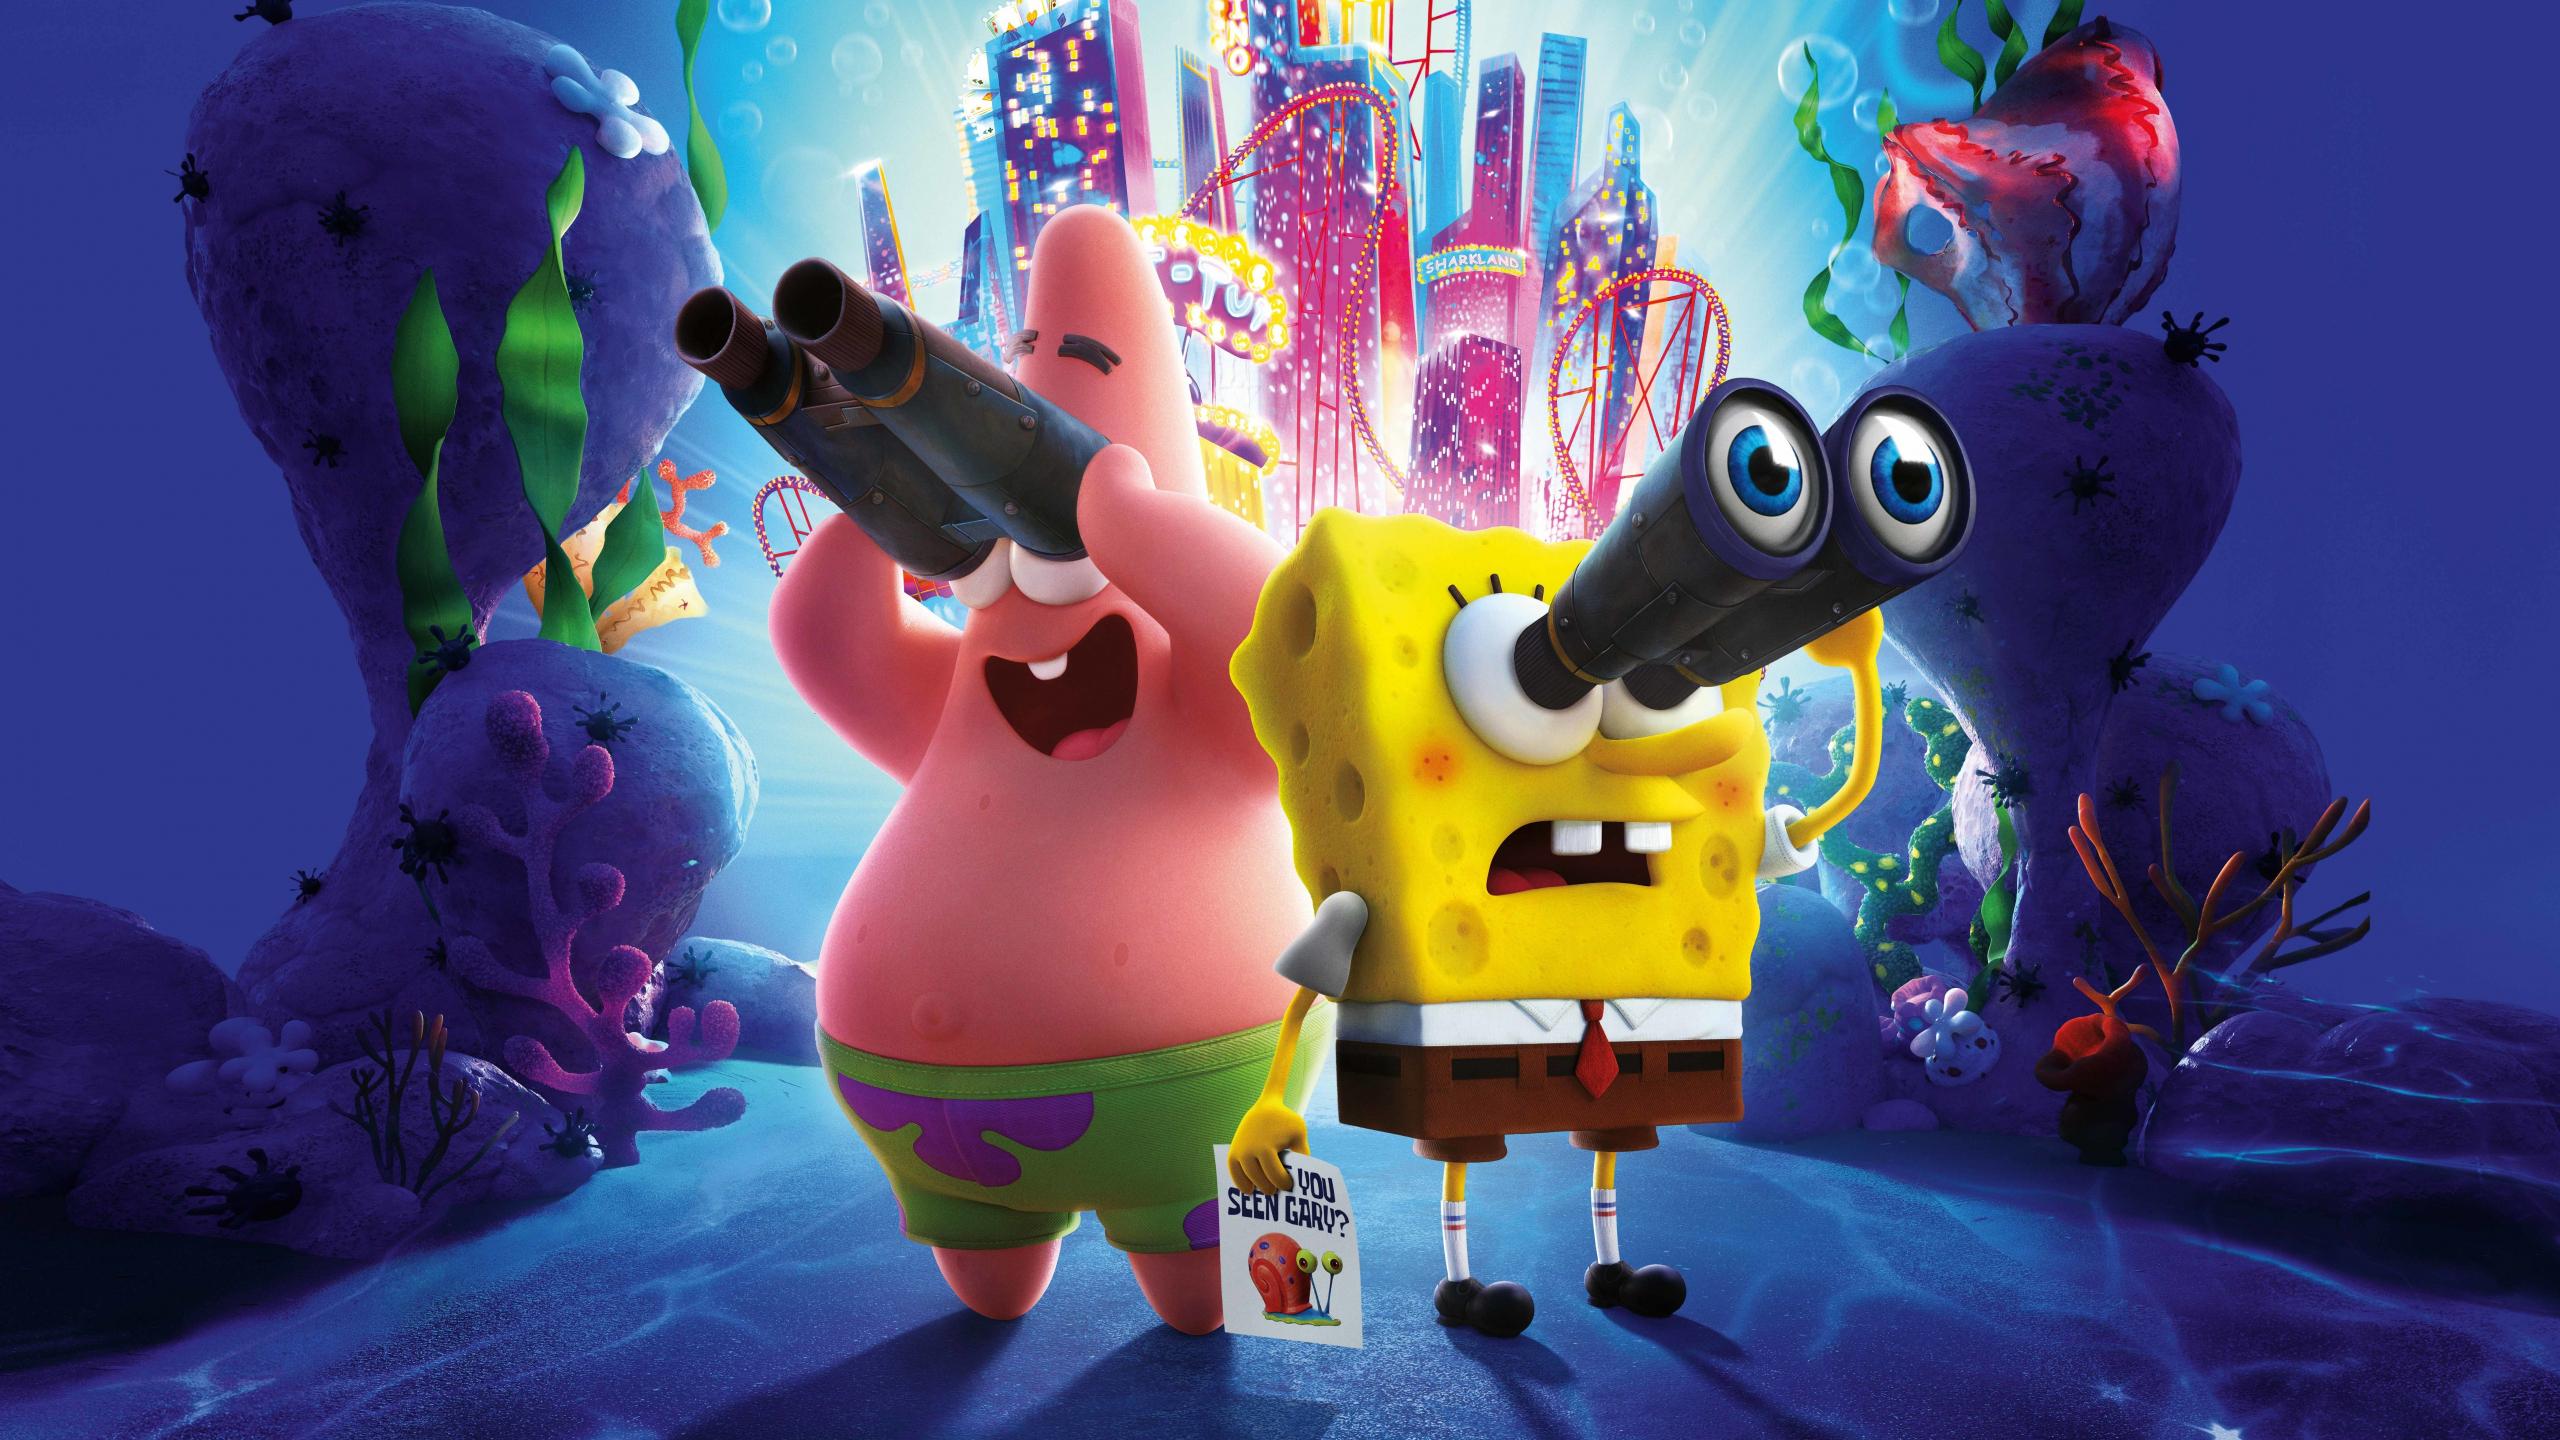 Download 2560x1440 Wallpaper The Spongebob Movie Sponge On The Run 2020 Movie Dual Wide Widescreen 16 9 Widescreen 2560x1440 Hd Image Background 24201